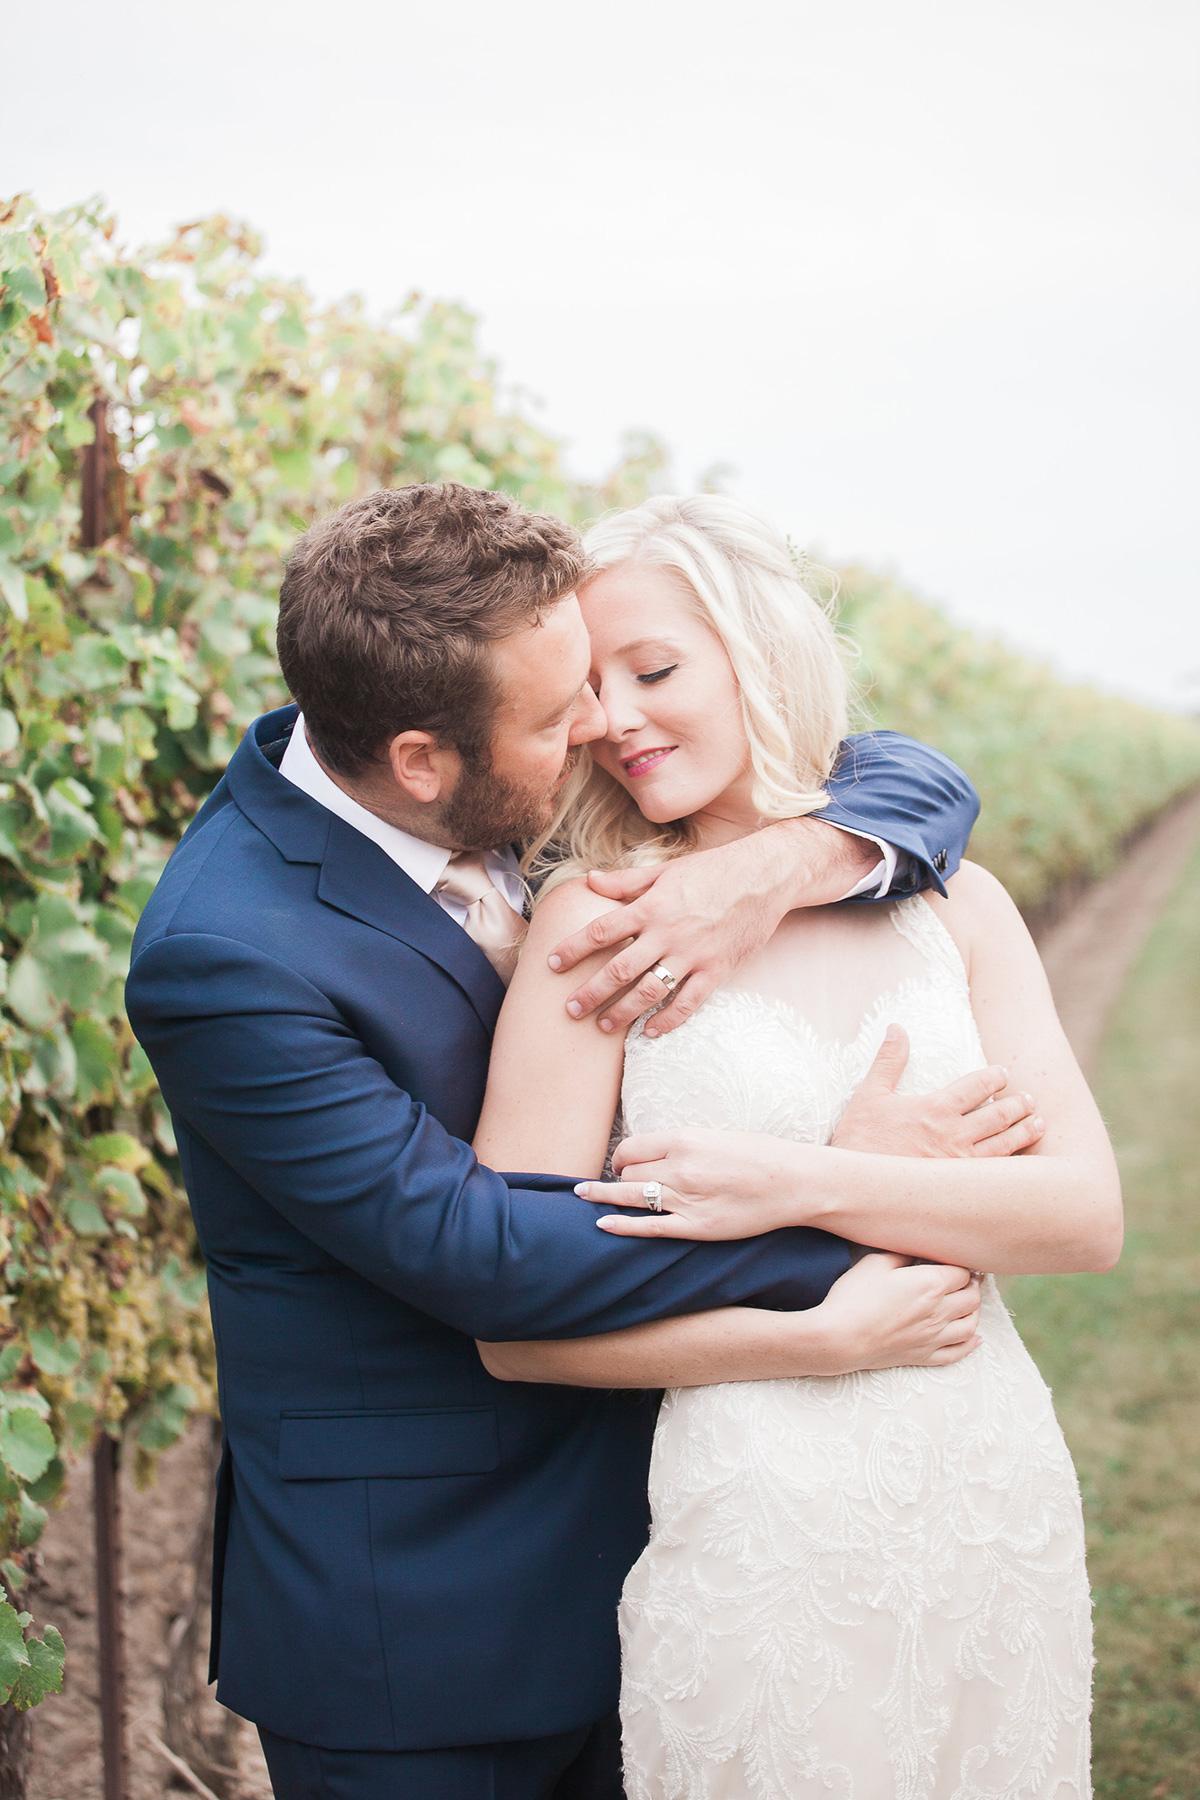 gemini-photography-vineyard-bride-swish-list-honsberger-estates-jordan-wedding-38.jpg